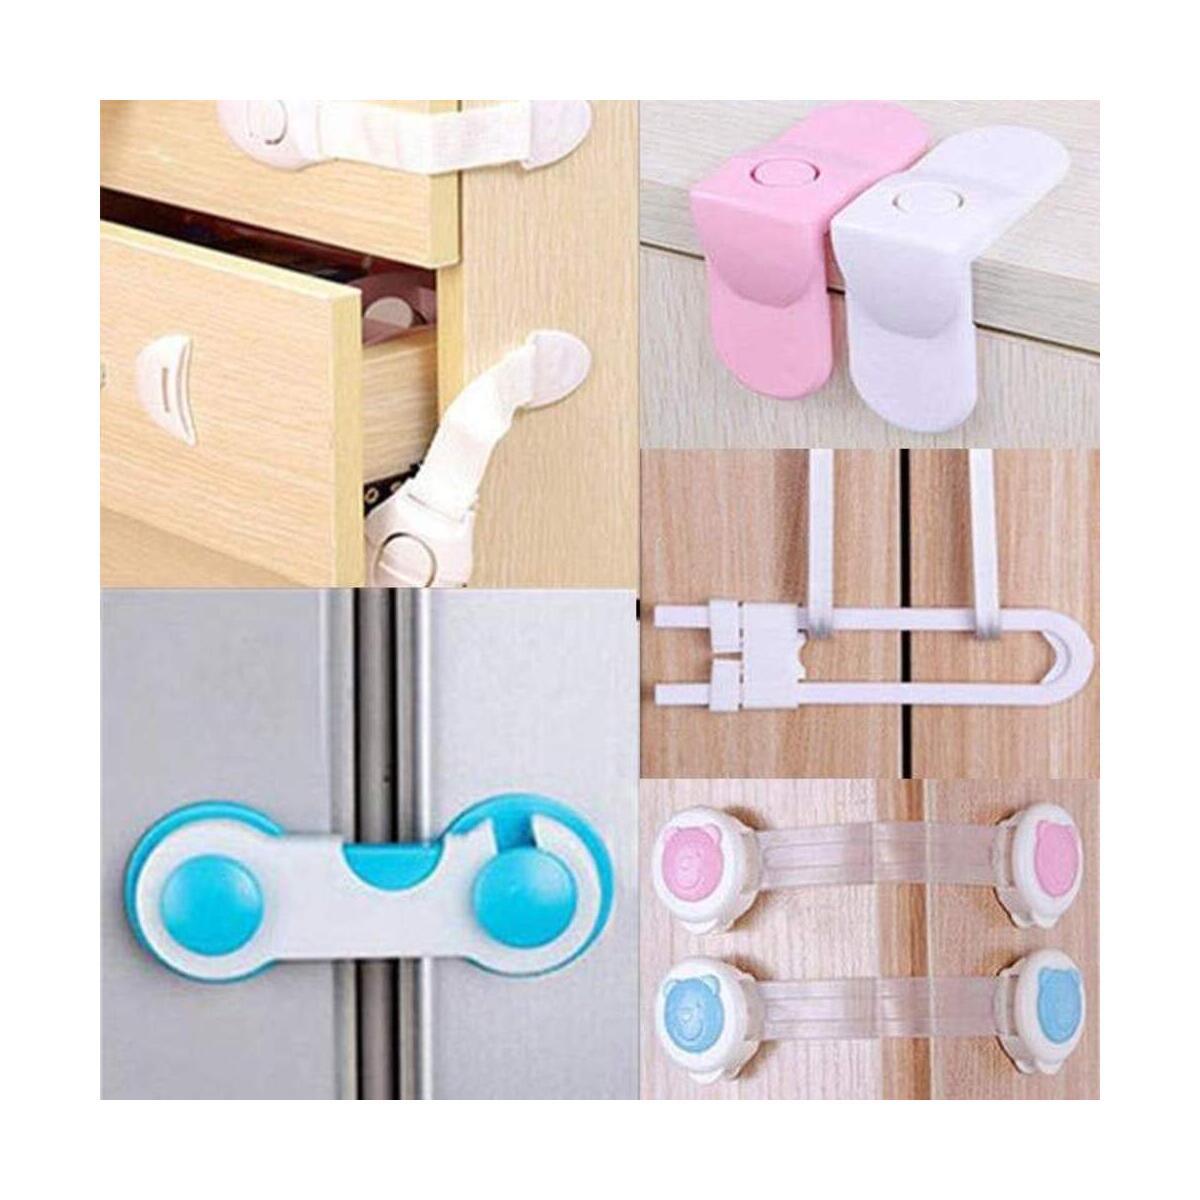 Child Safety Adjustable Strap Cabinet Lock